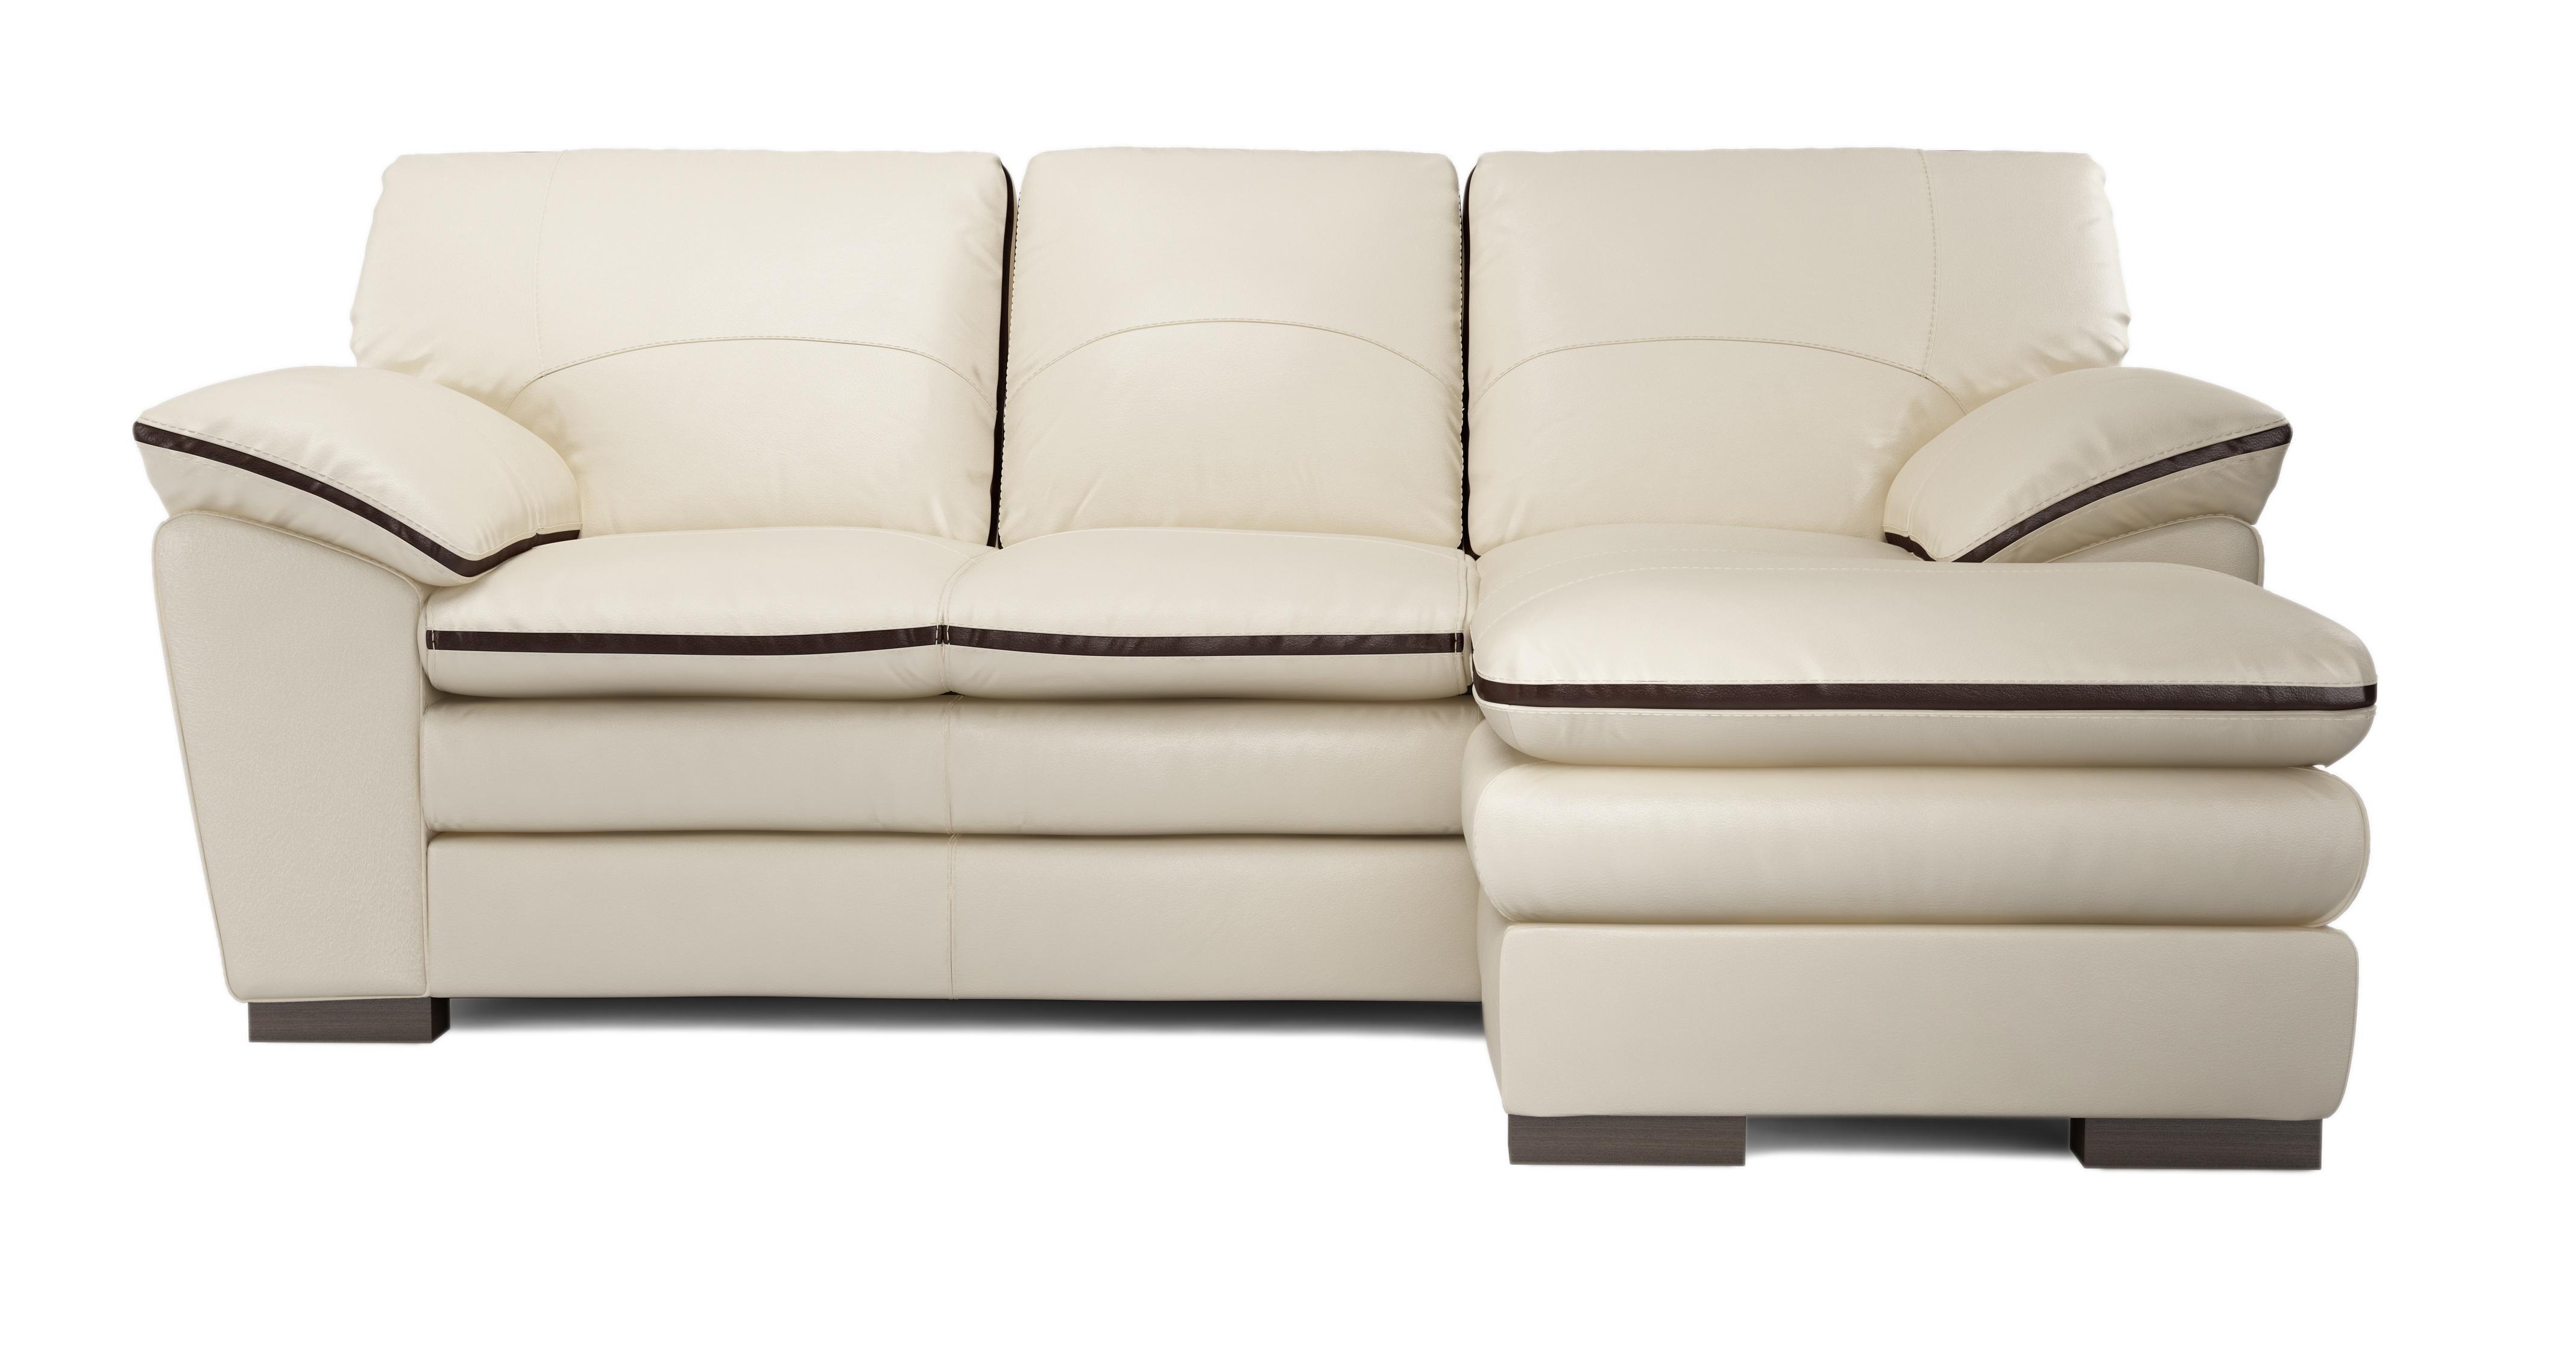 DFS Deco 100% Leather Set Inc RHF Chaise End Sofa ...